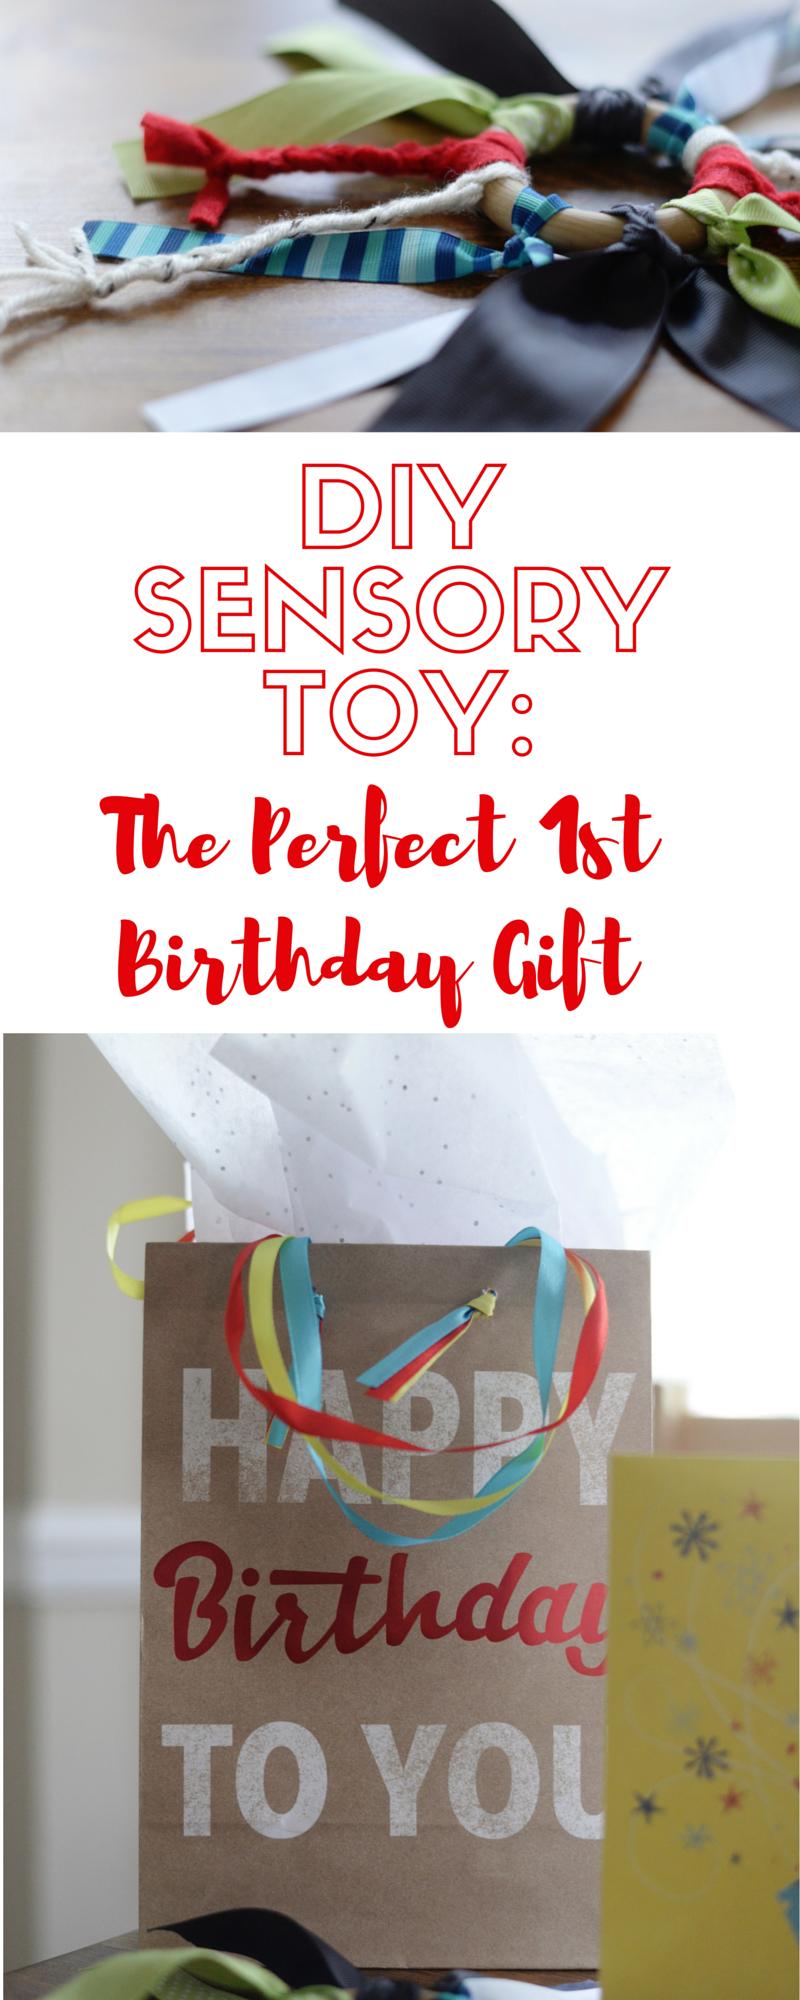 diy sensory toy first birthday gift